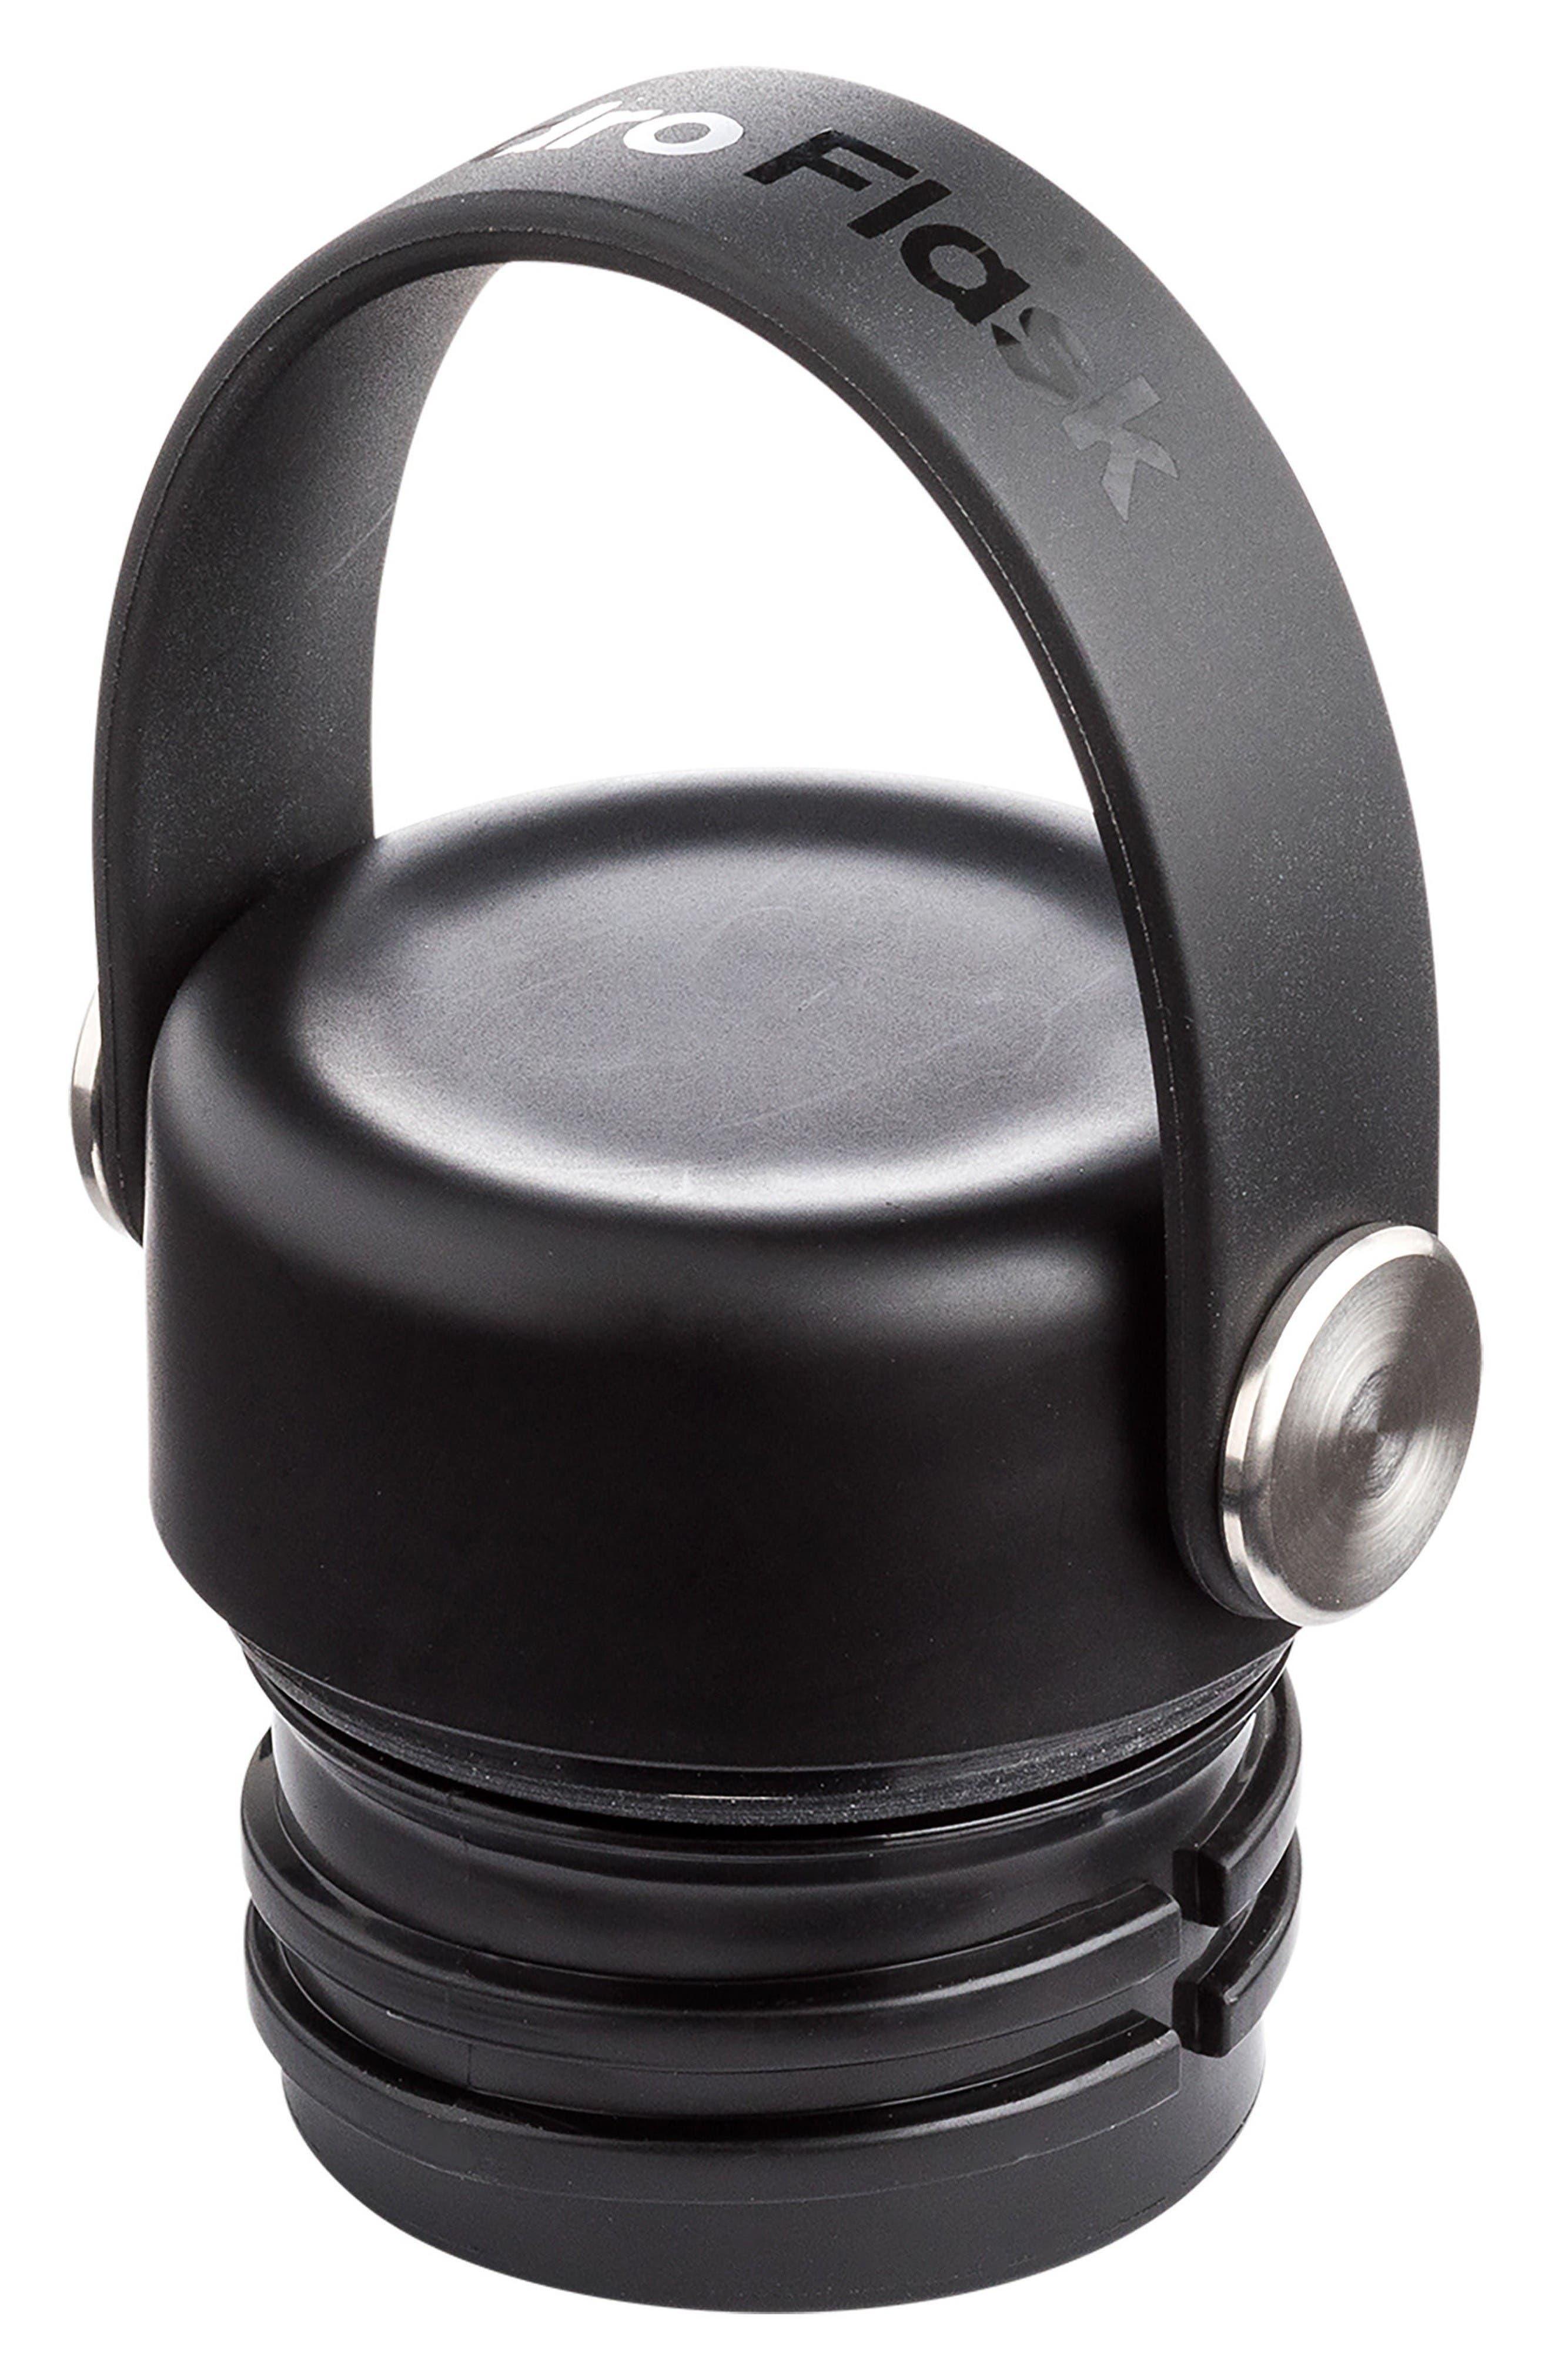 Main Image - Hydro Flask Standard Mouth Flex Cap